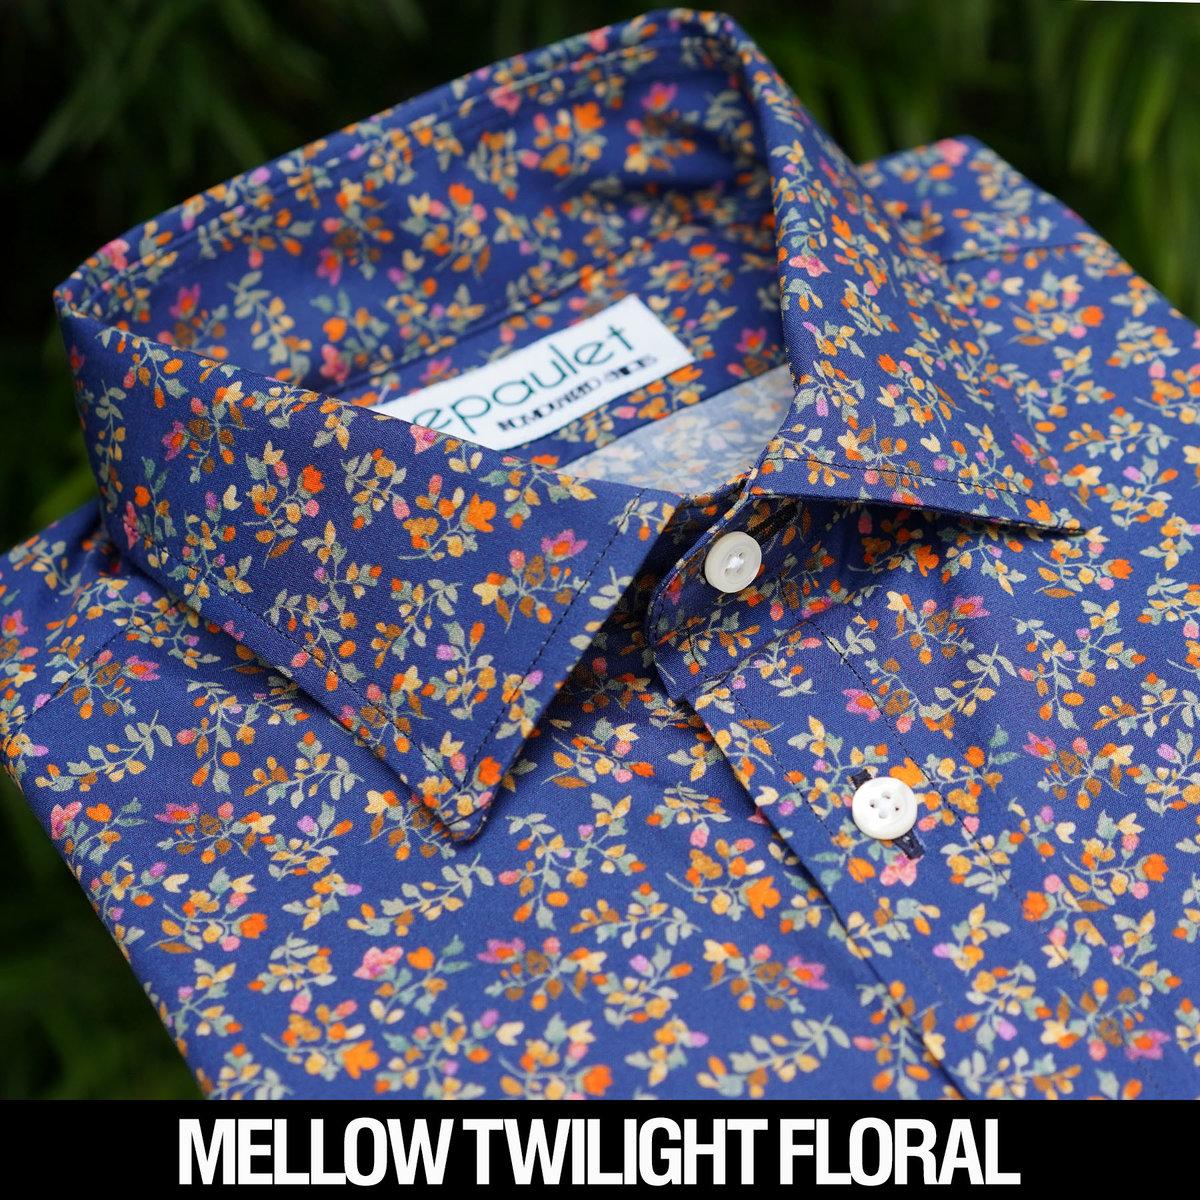 MELLOW TWILIGHT FLORAL.jpg